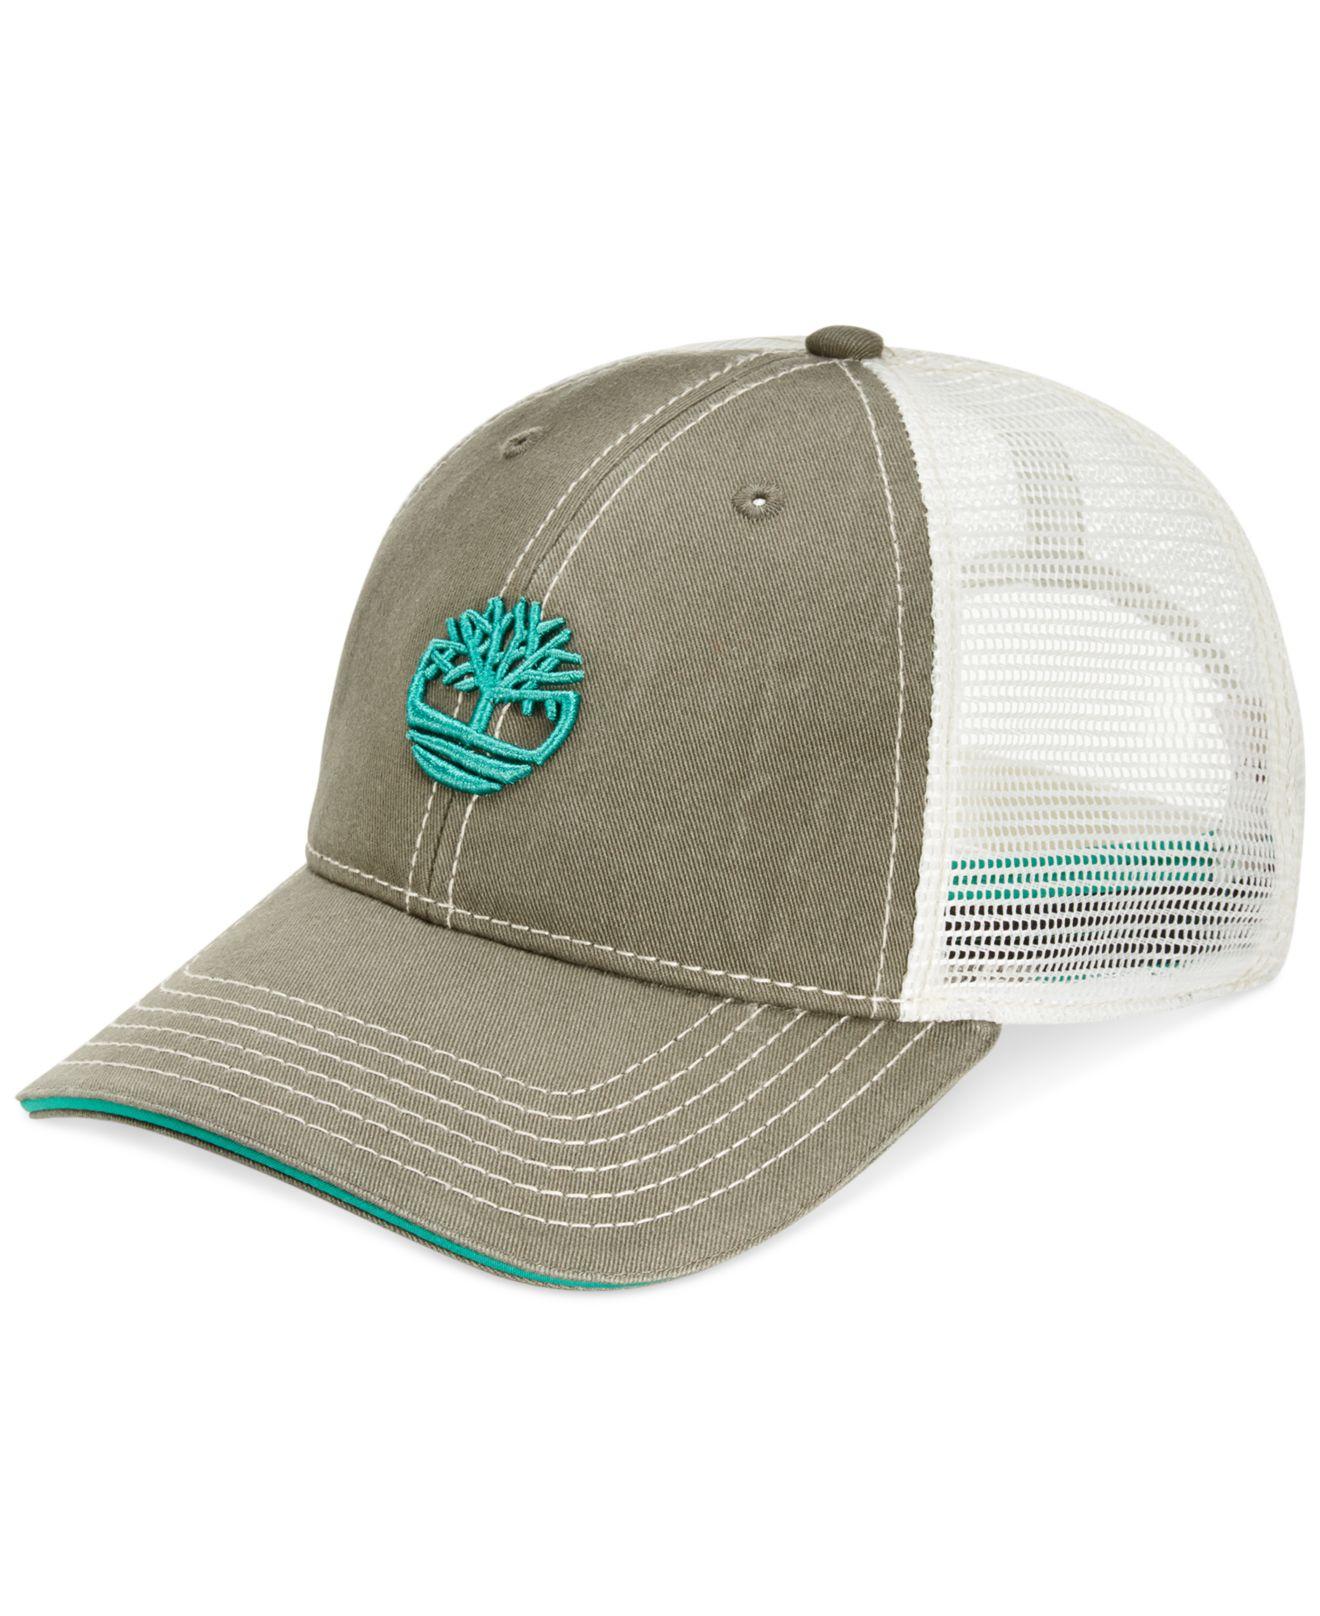 6cdb8f6d Timberland Cotton Twill Trucker Hat in Green for Men - Lyst